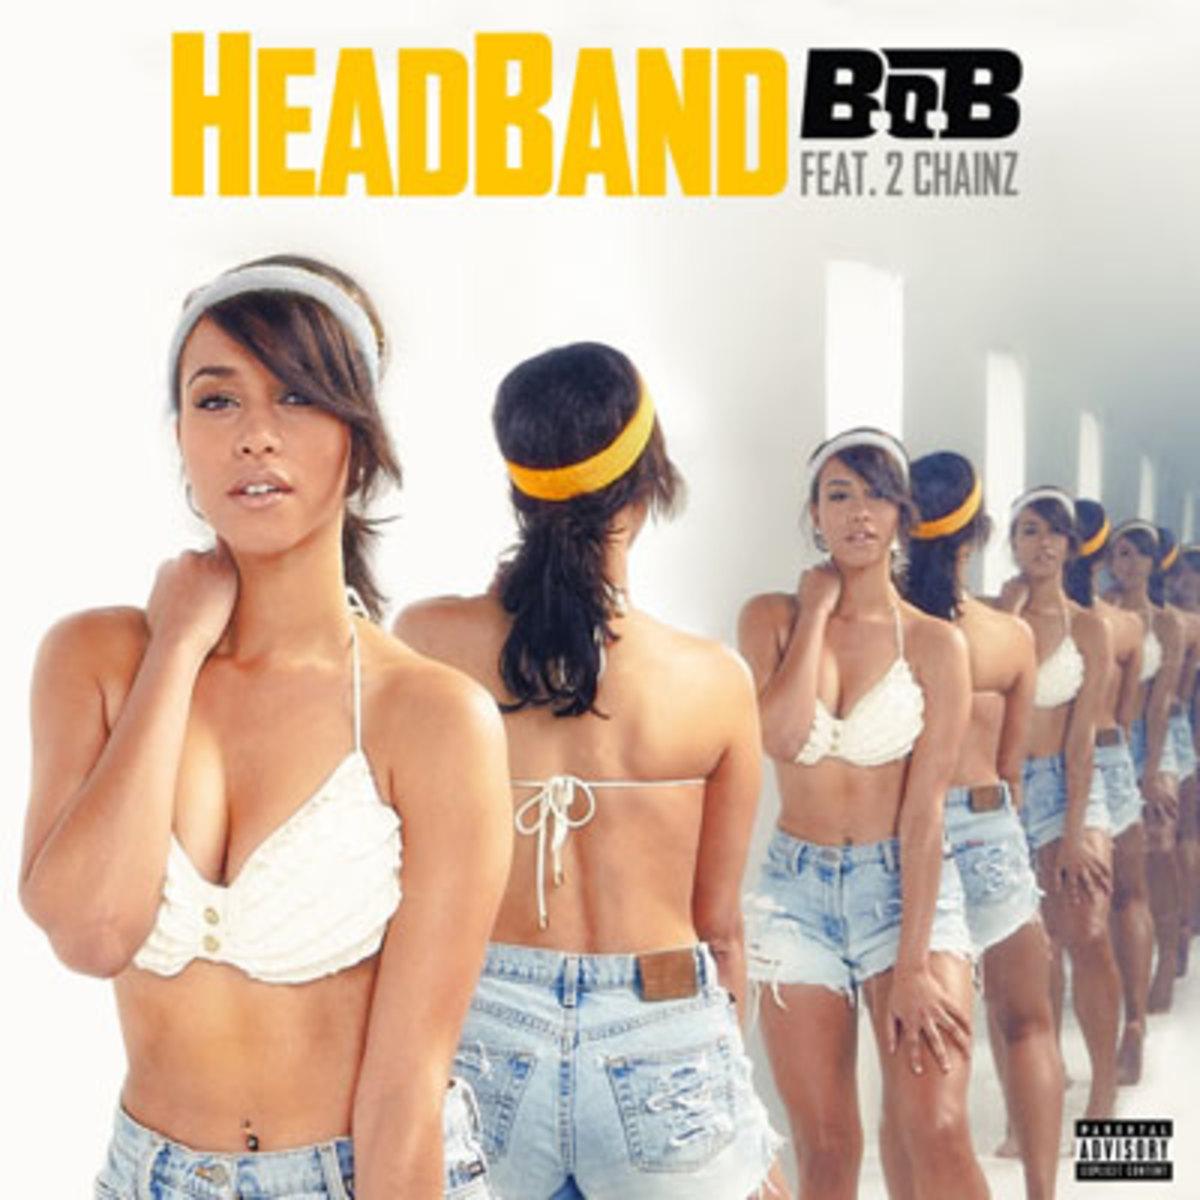 bob-headband.jpg